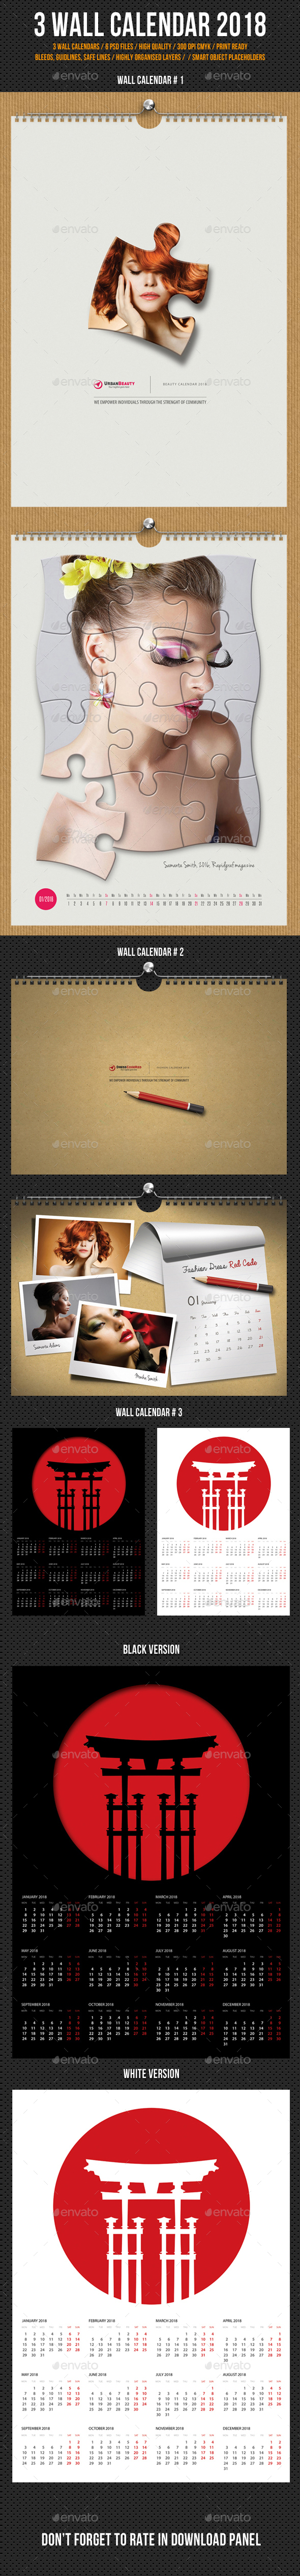 3 in 1 Wall Calendar 2018 Bundle V11 - Calendars Stationery